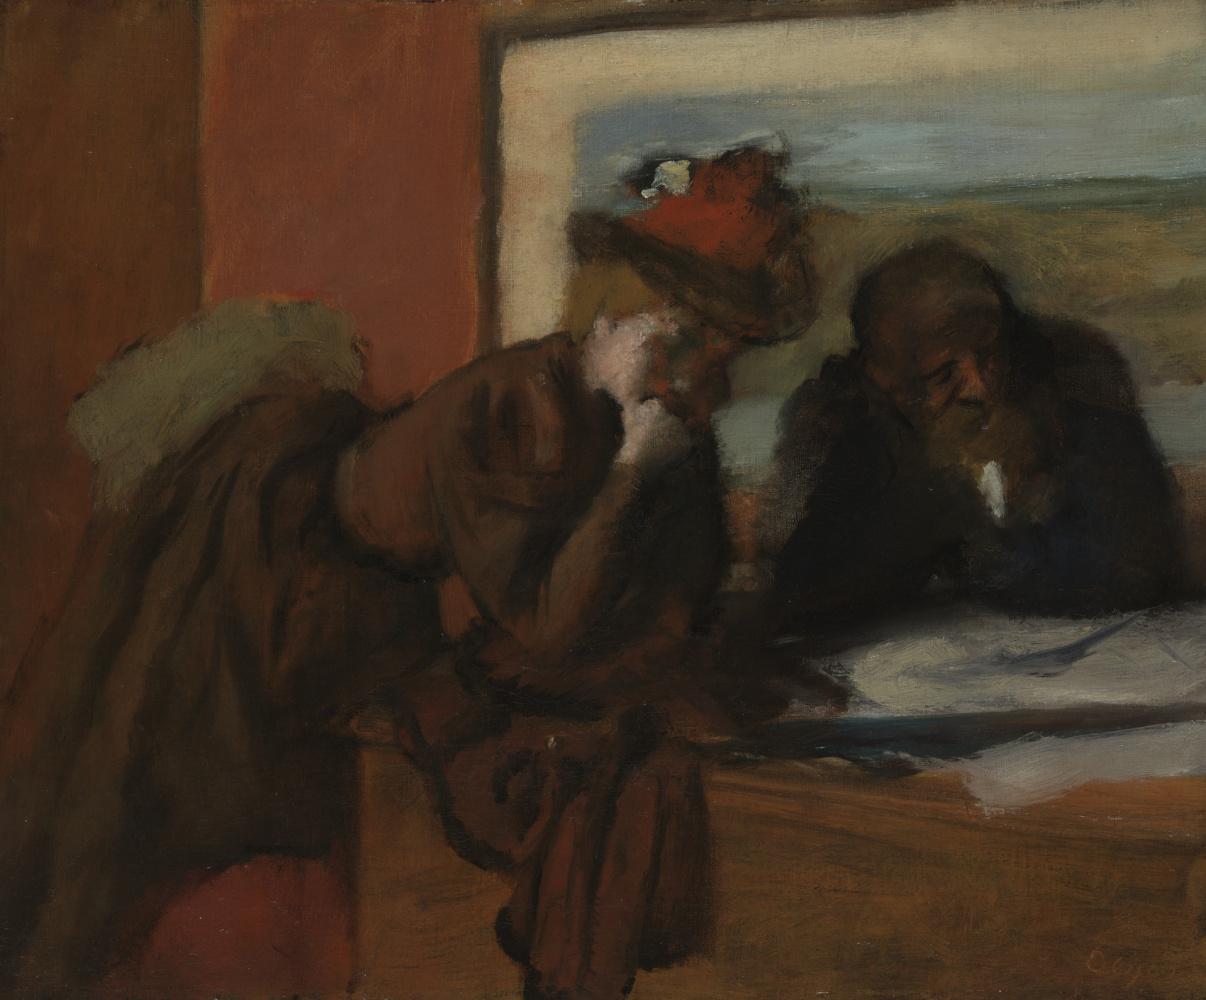 Edgar Degas. The conversation